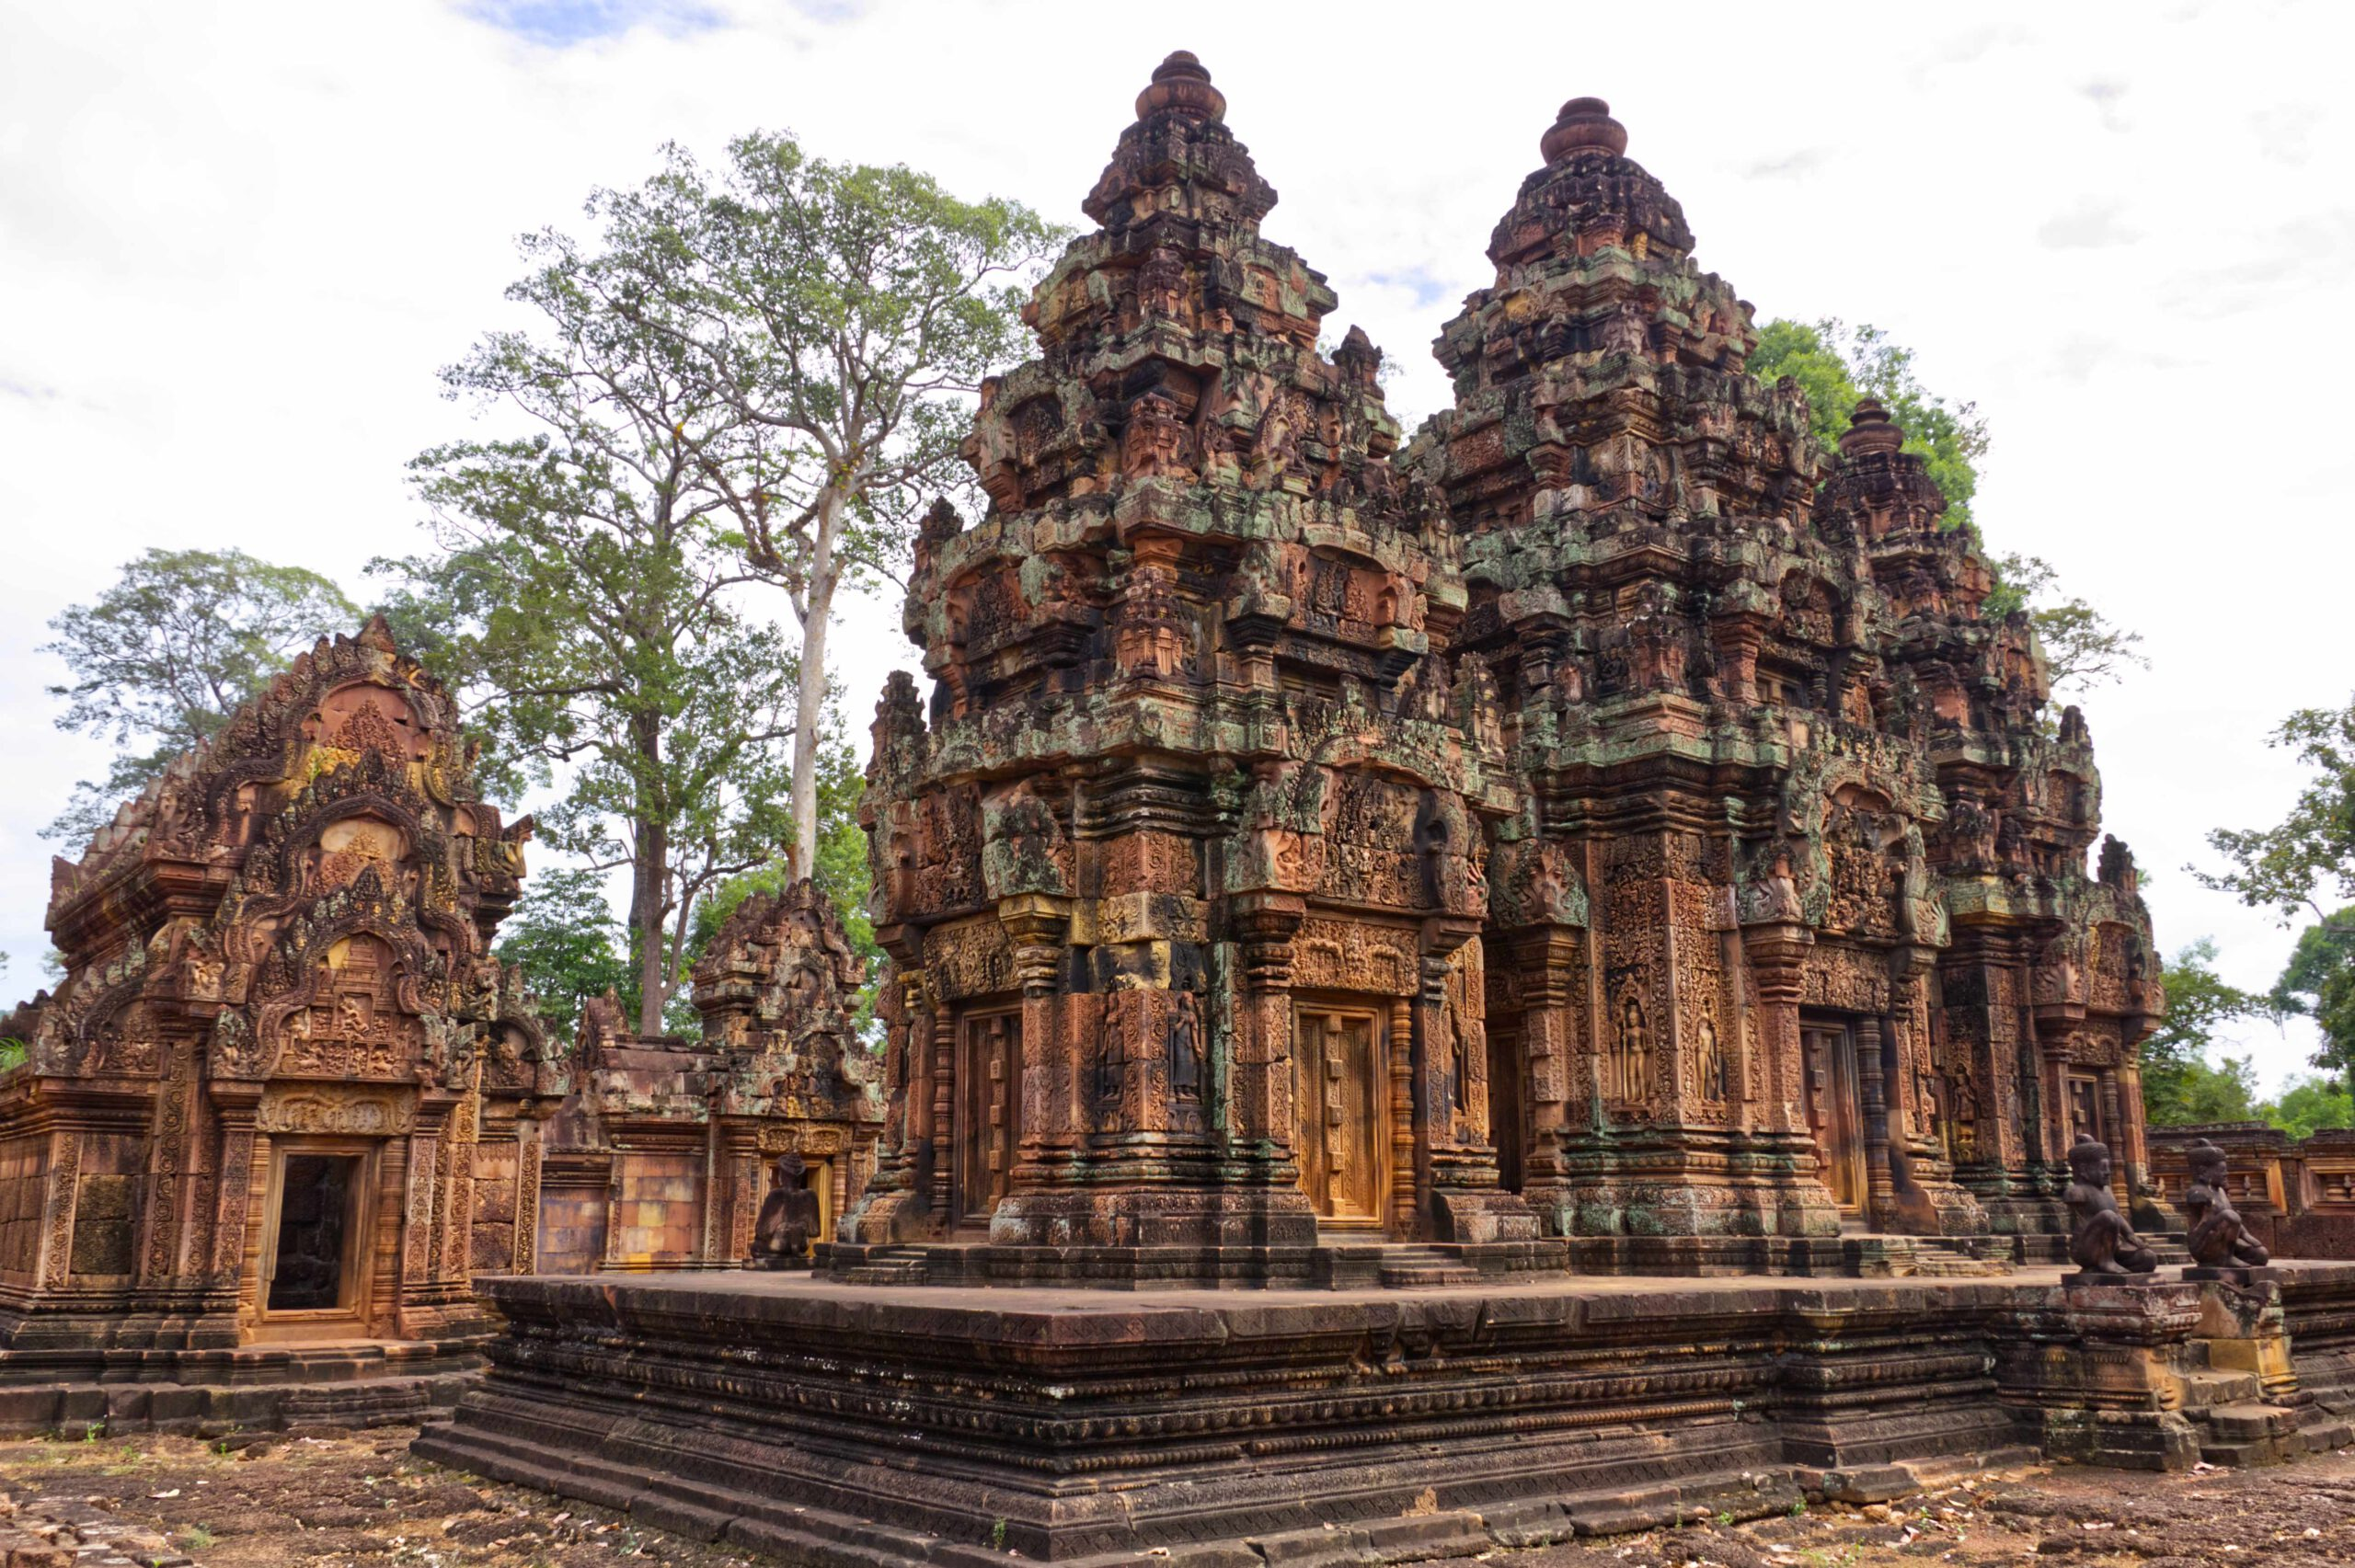 Banteay Srei Tempel in Kambodscha, orangefarben